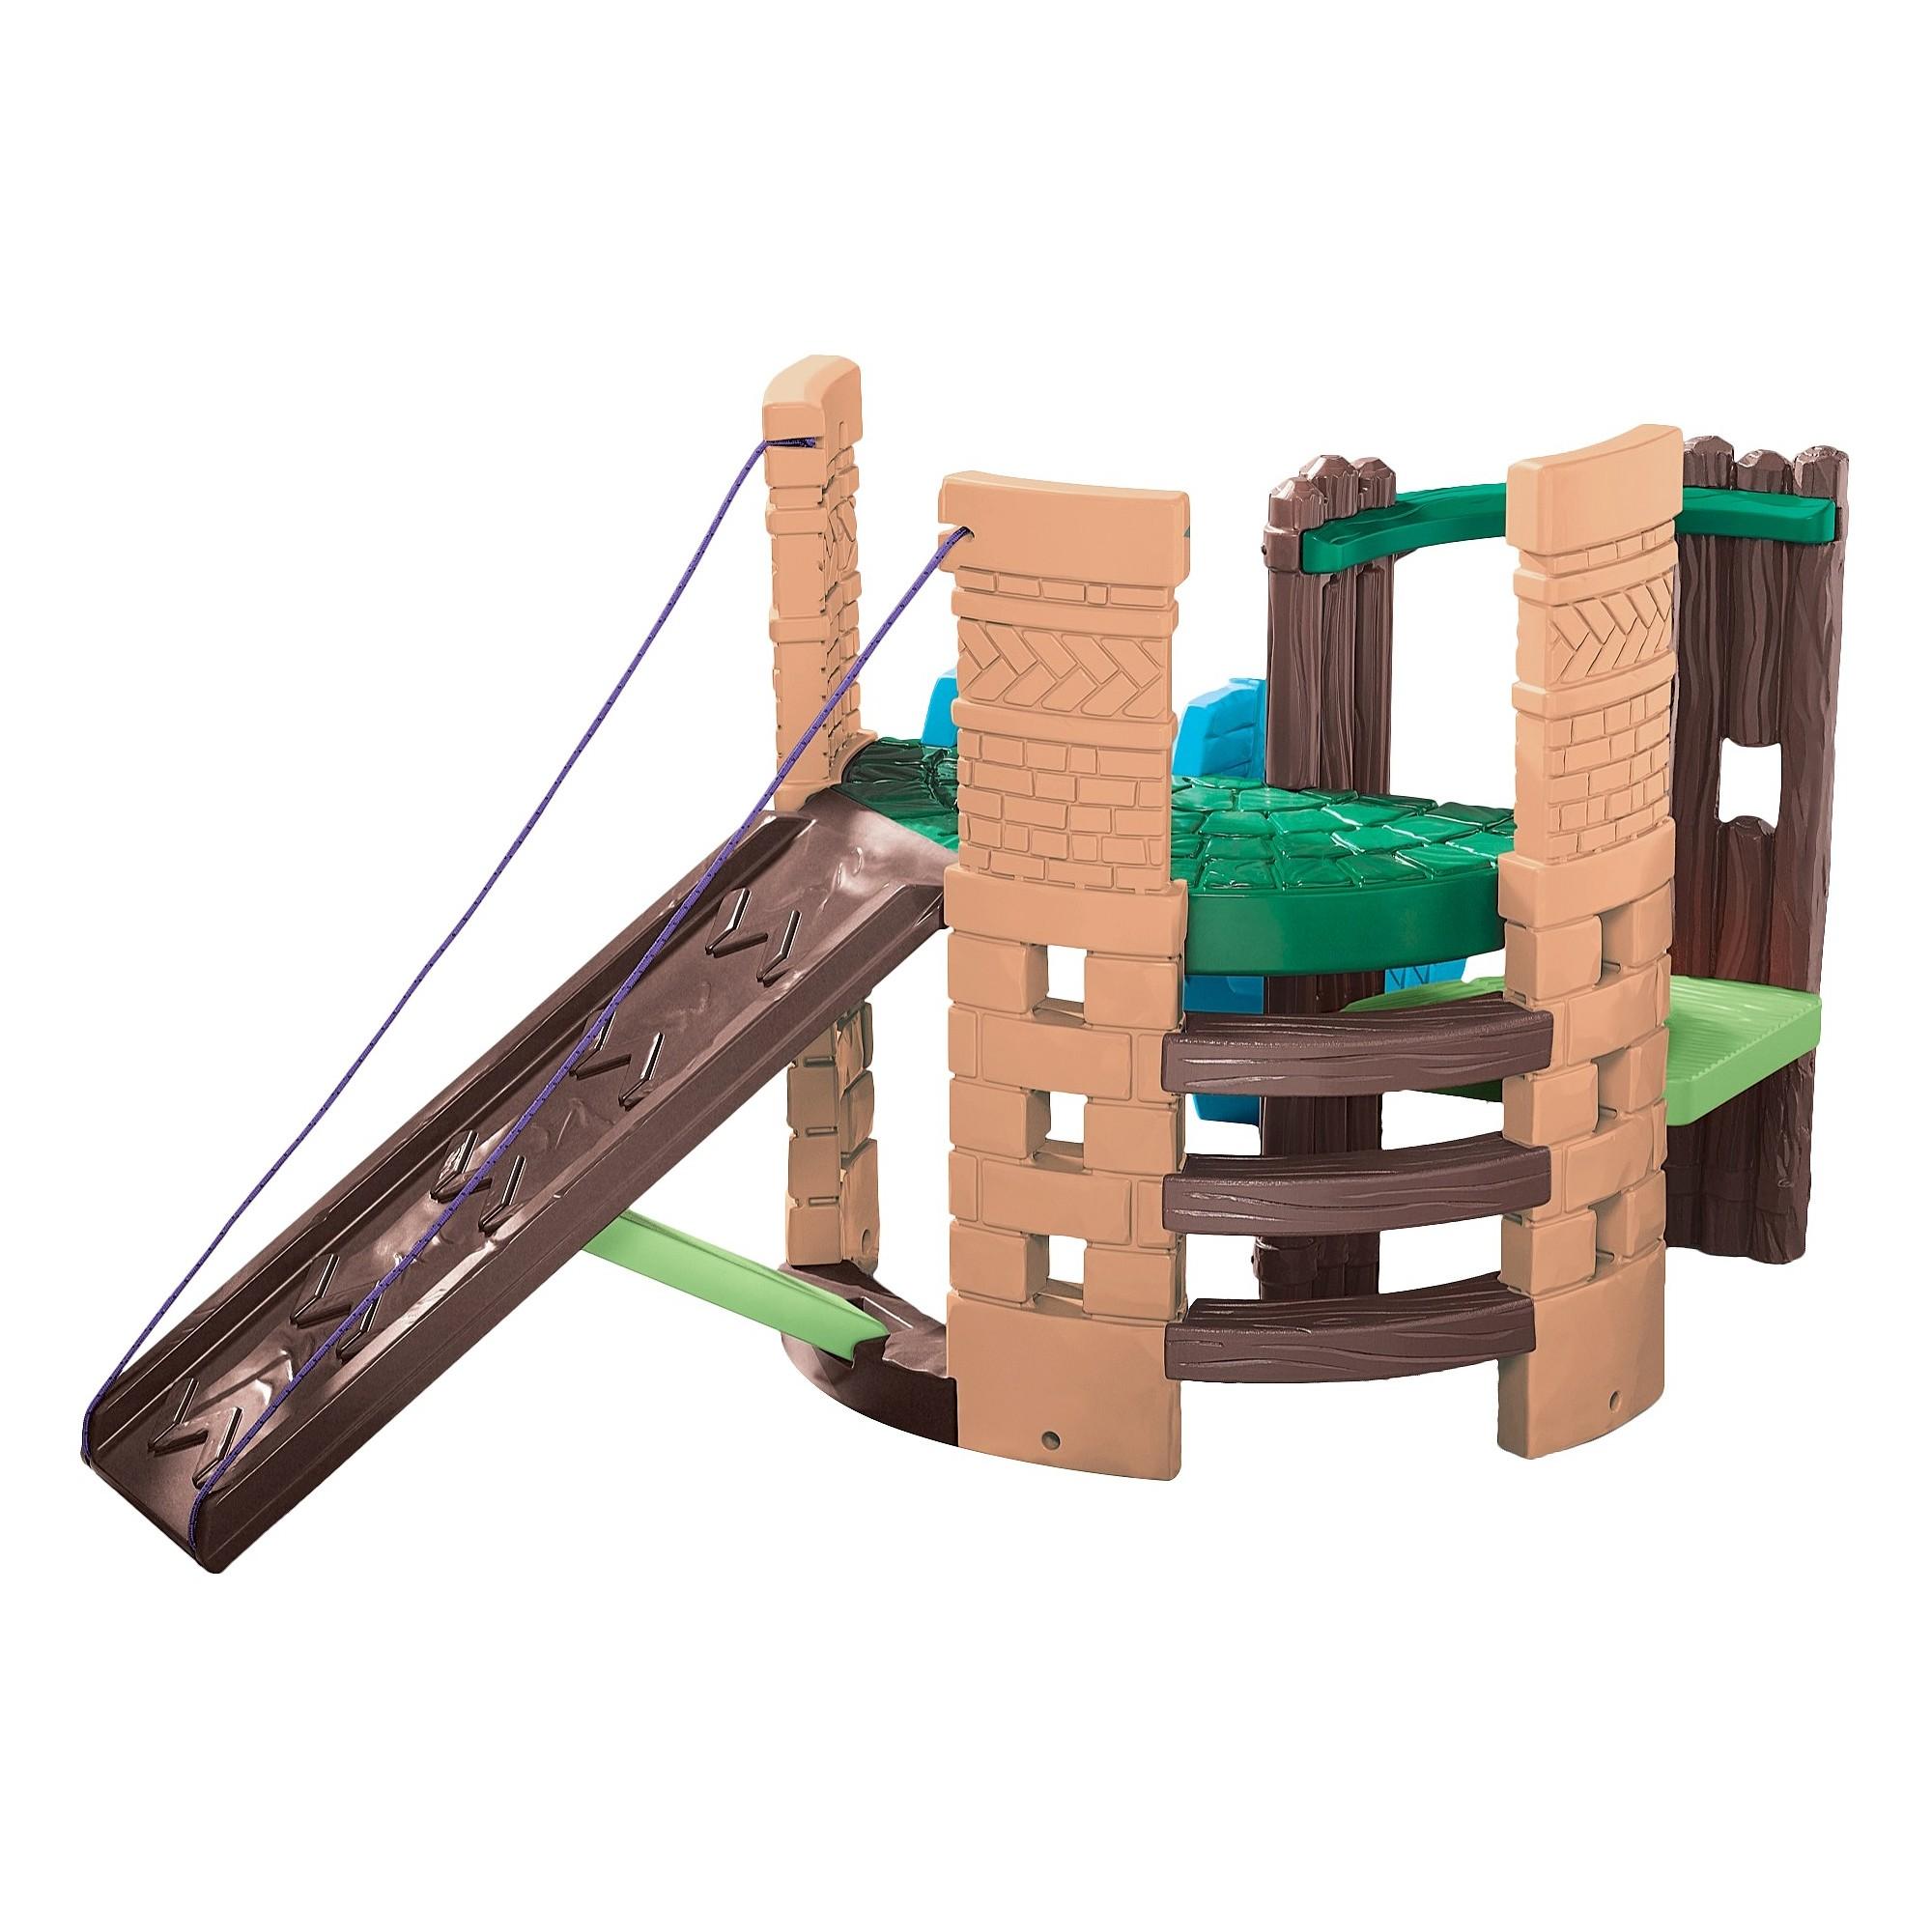 Little Tikes 2In1 Castle Climber, Little tikes